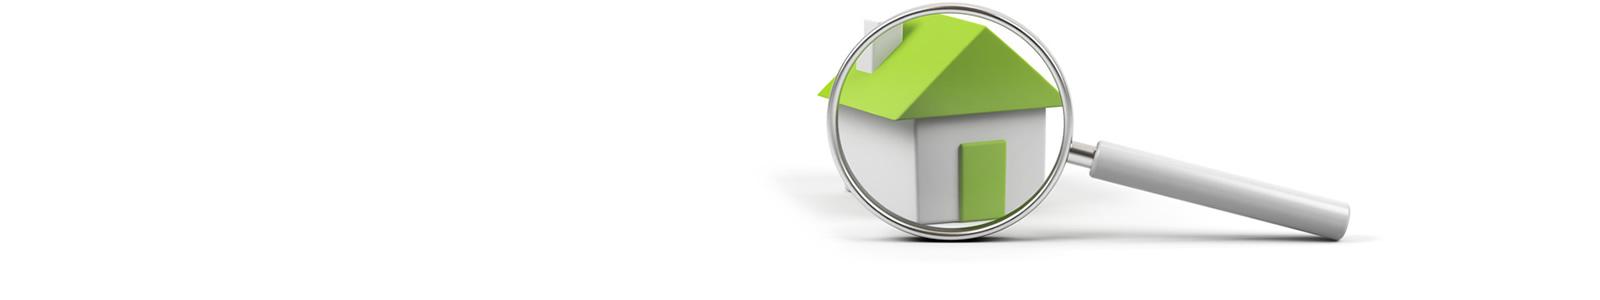 Immobilien Gutachter: Immobilien kaufen - Zustand - Sanierungen